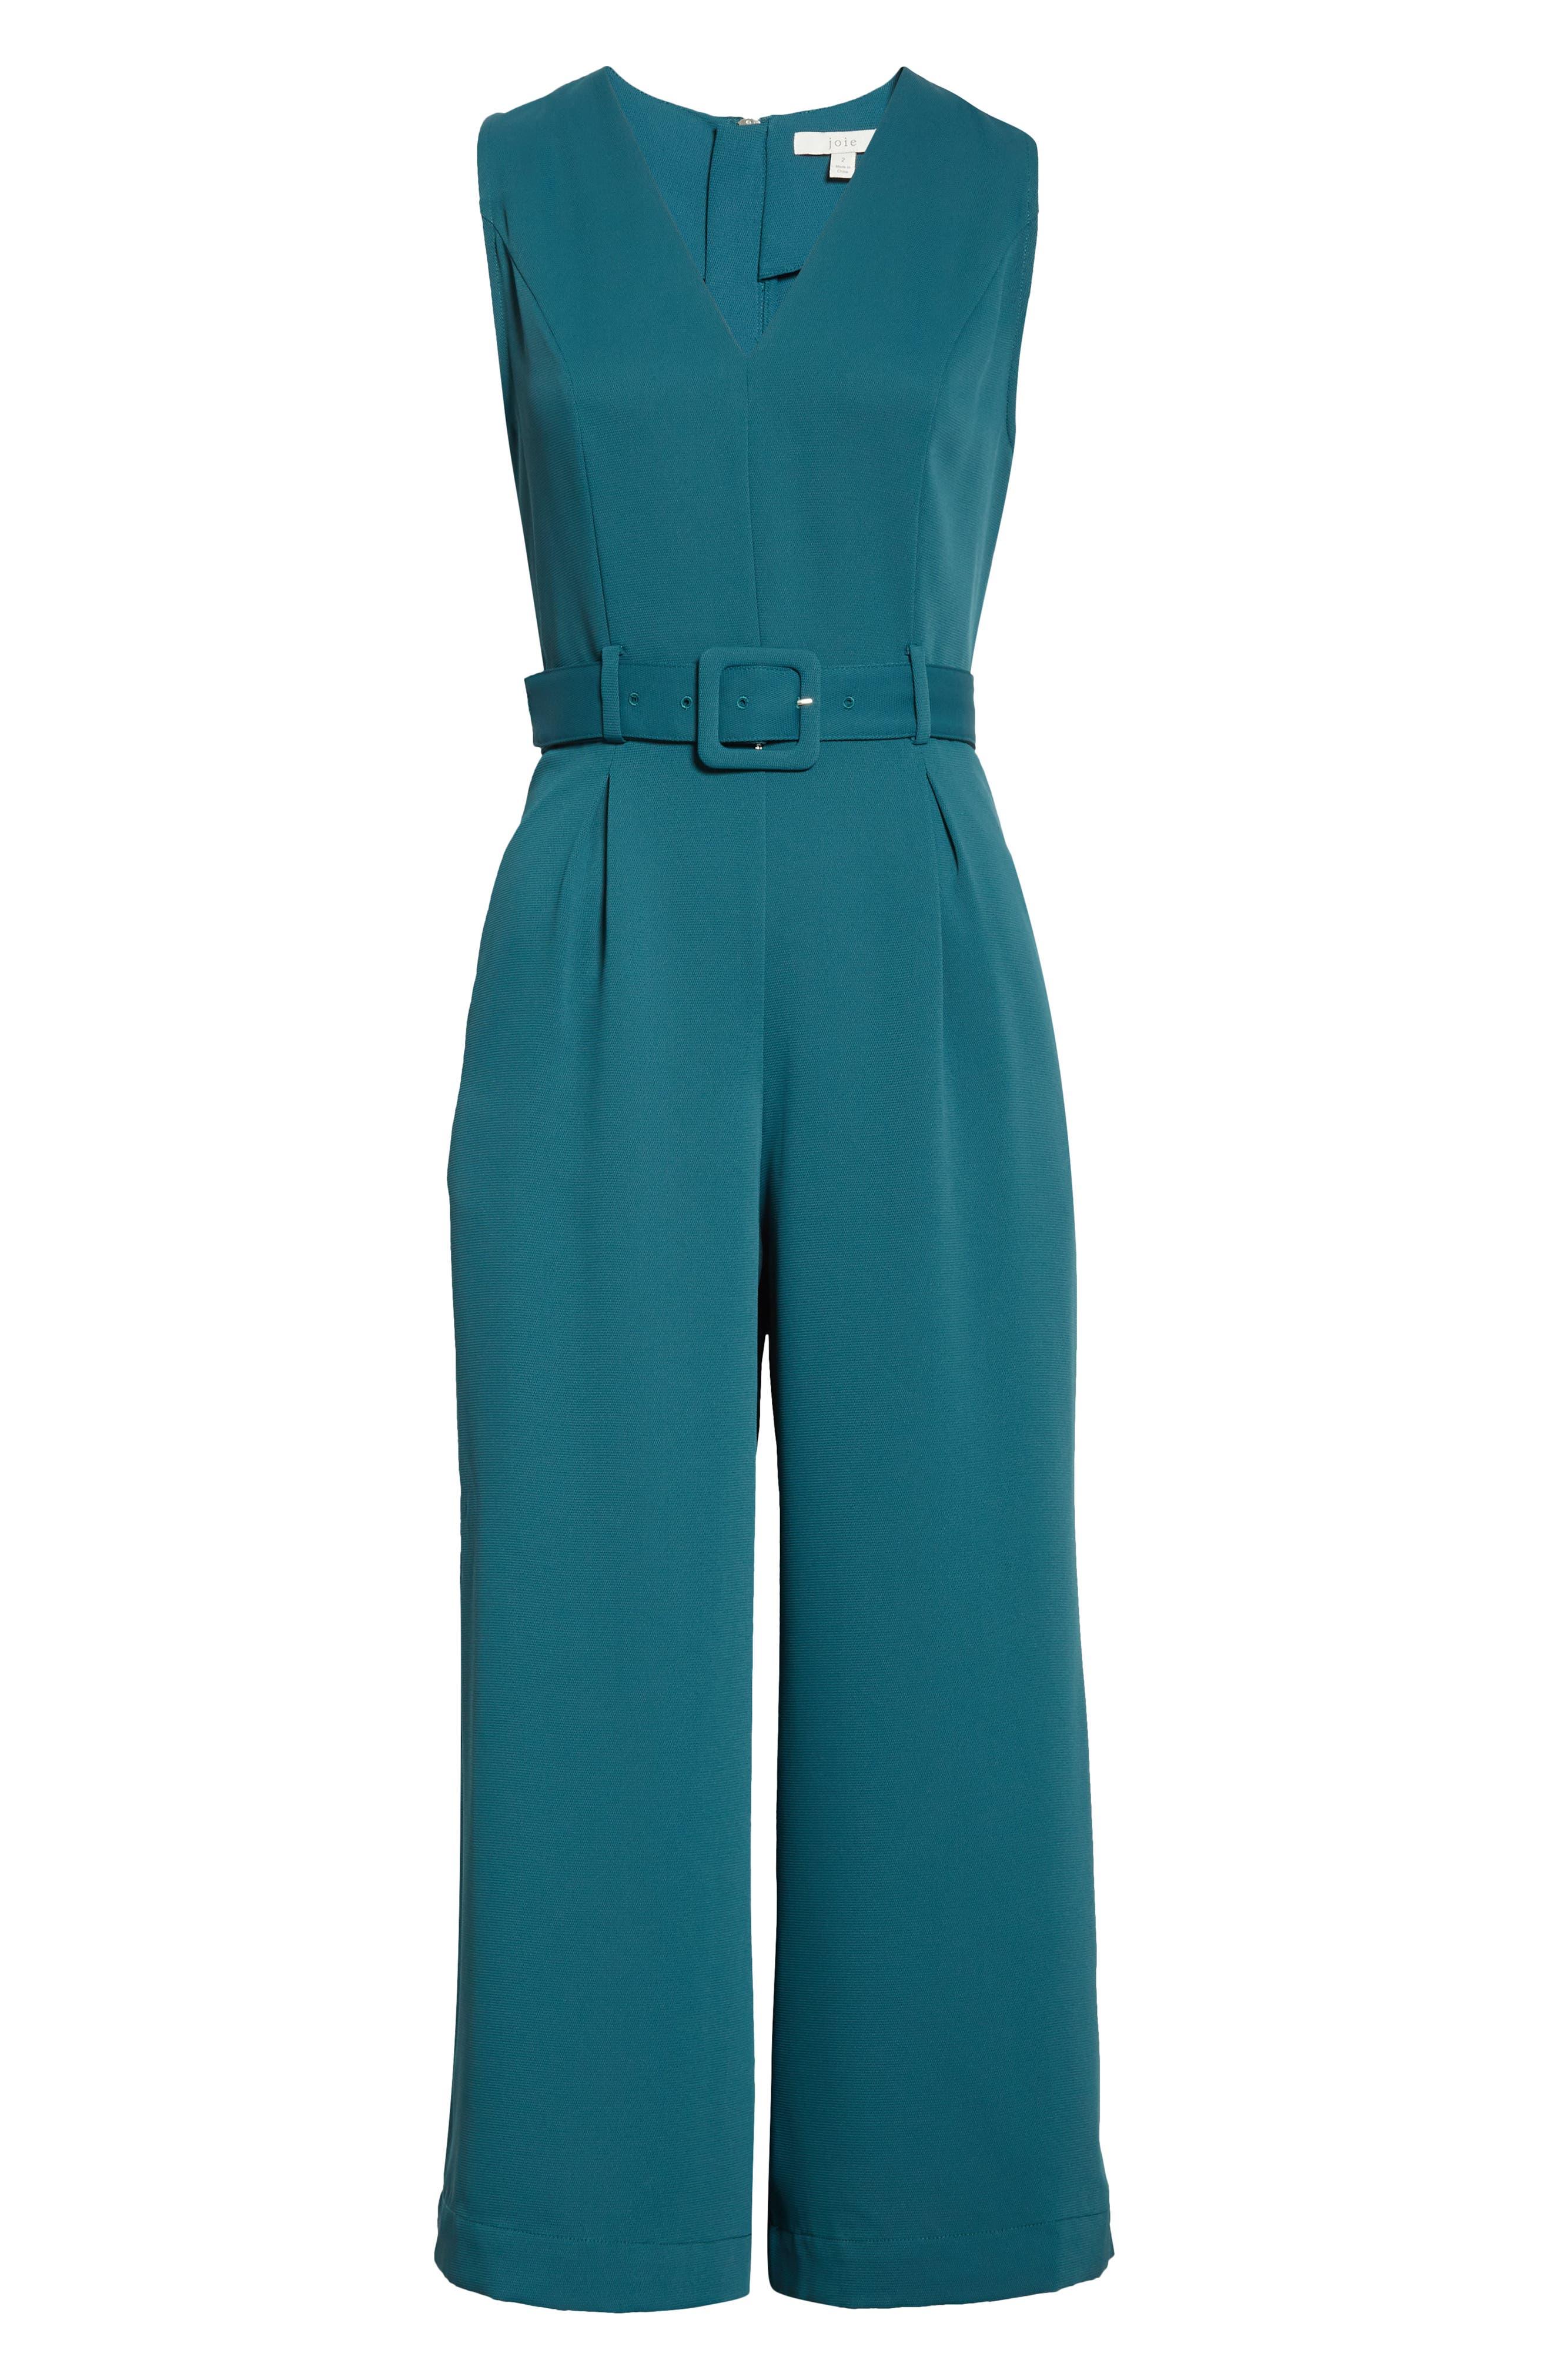 Joie Suits Adessa Belted Jumpsuit